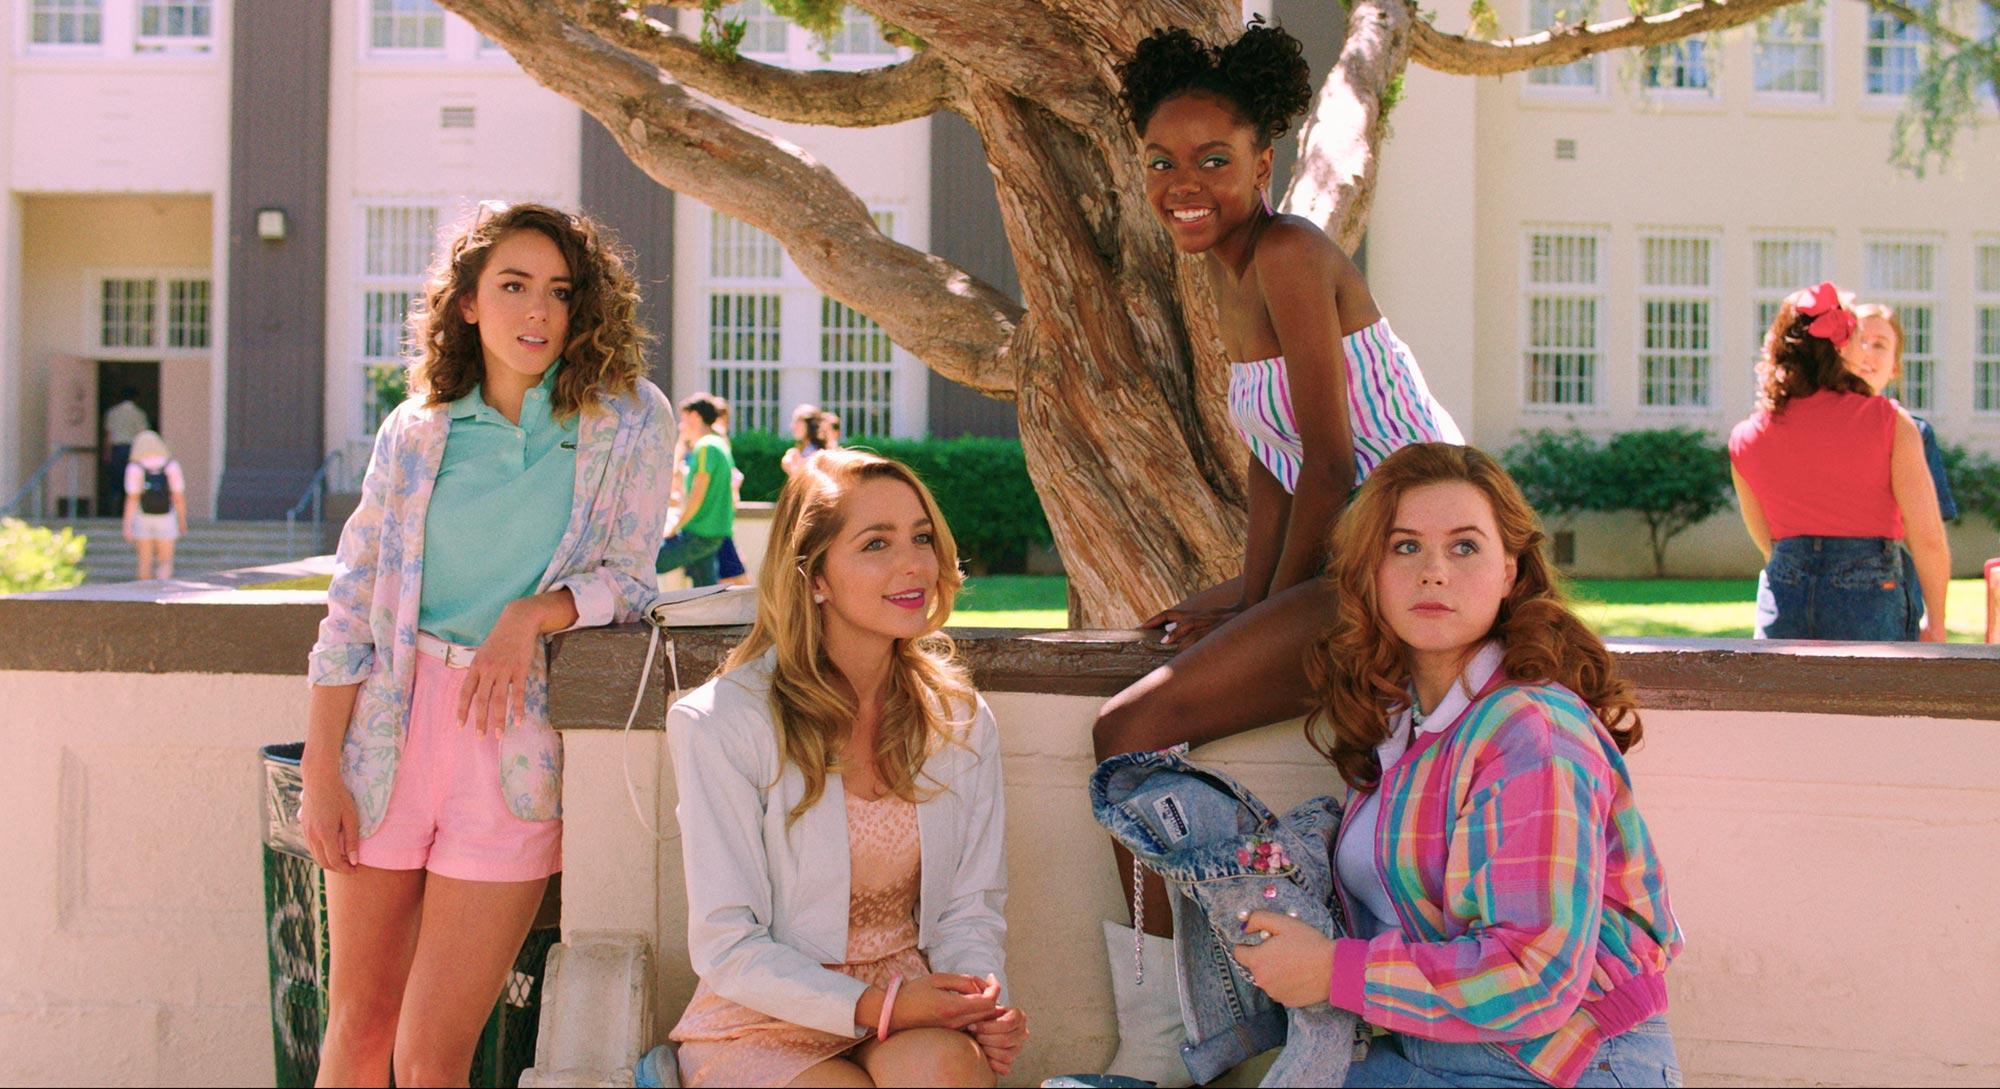 Valley Girl remake trailer: Riverdale, Happy Death Day stars got ...